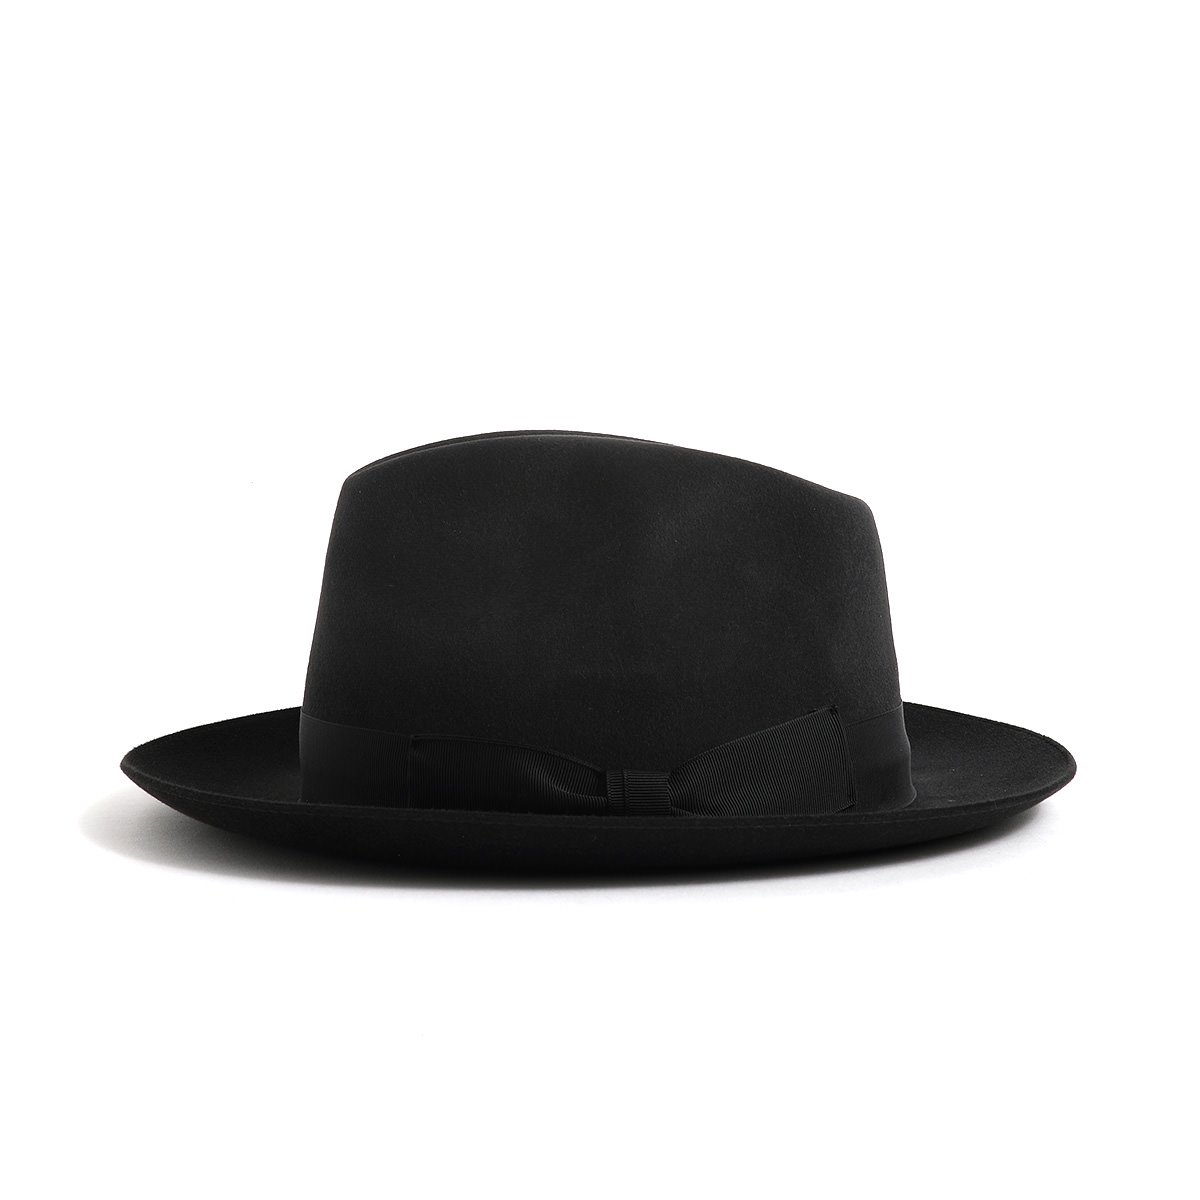 Rohw master product by Tesi AVAN FUR FELT HAT 詳細画像1